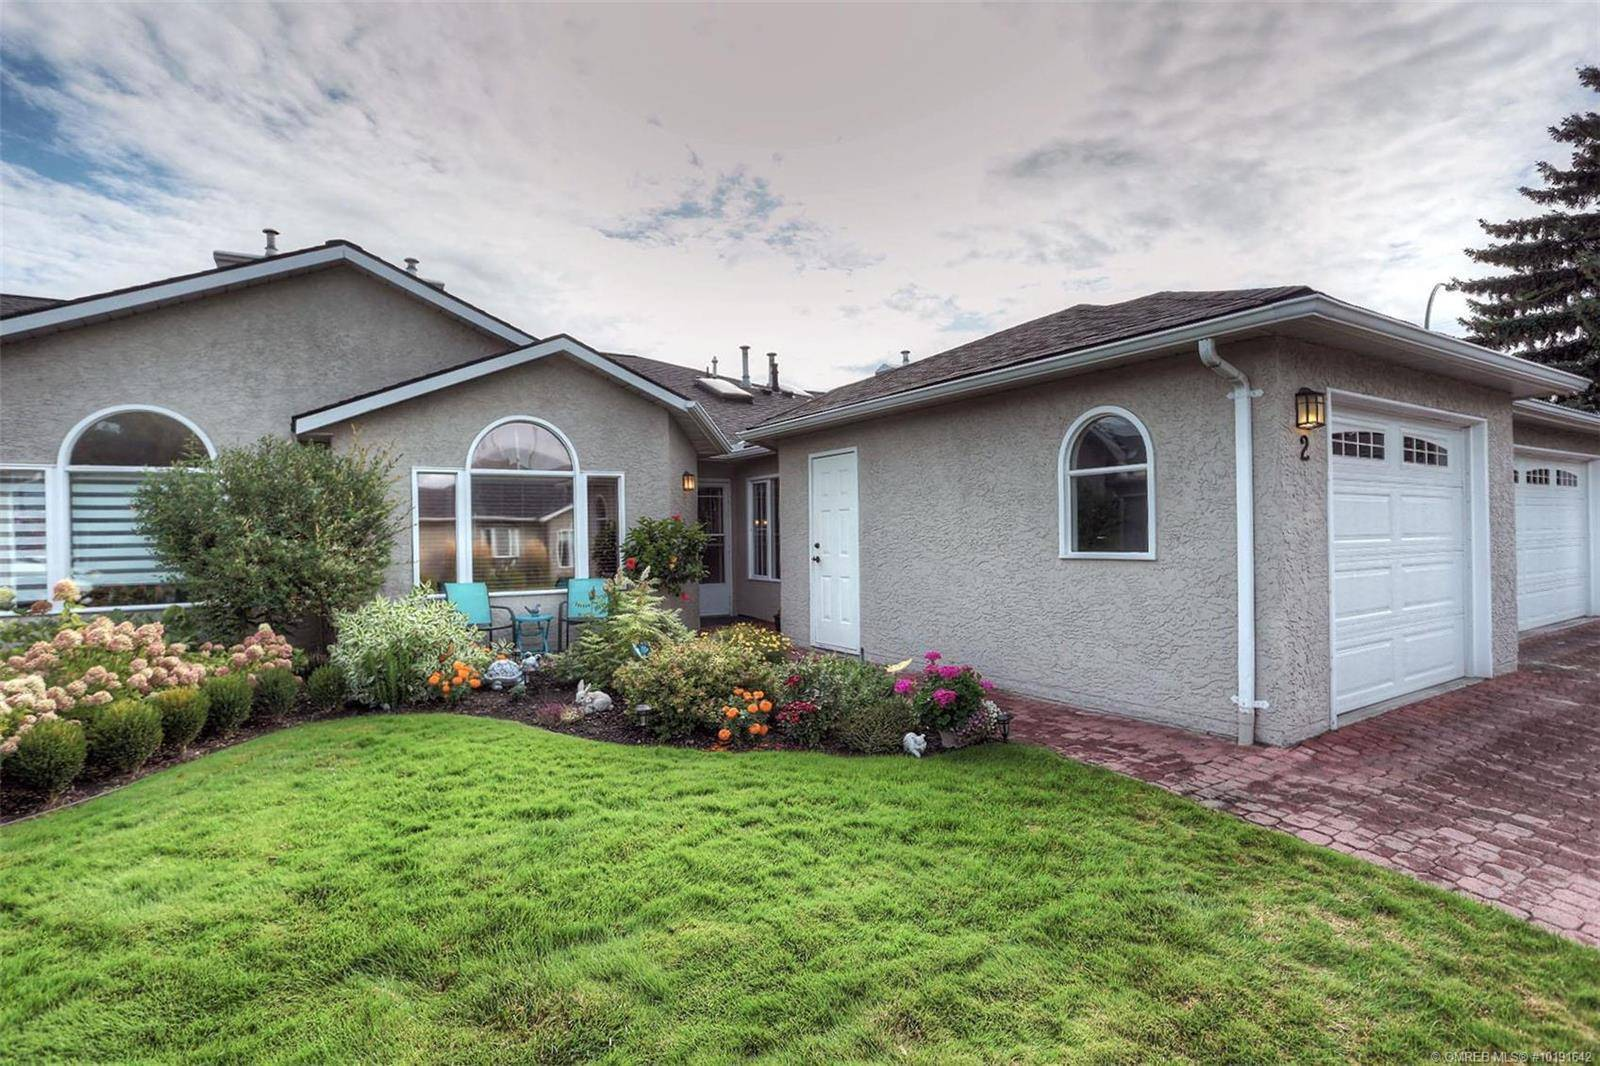 Townhouse for sale at 1020 Lanfranco Rd Unit 2 Kelowna British Columbia - MLS: 10191642